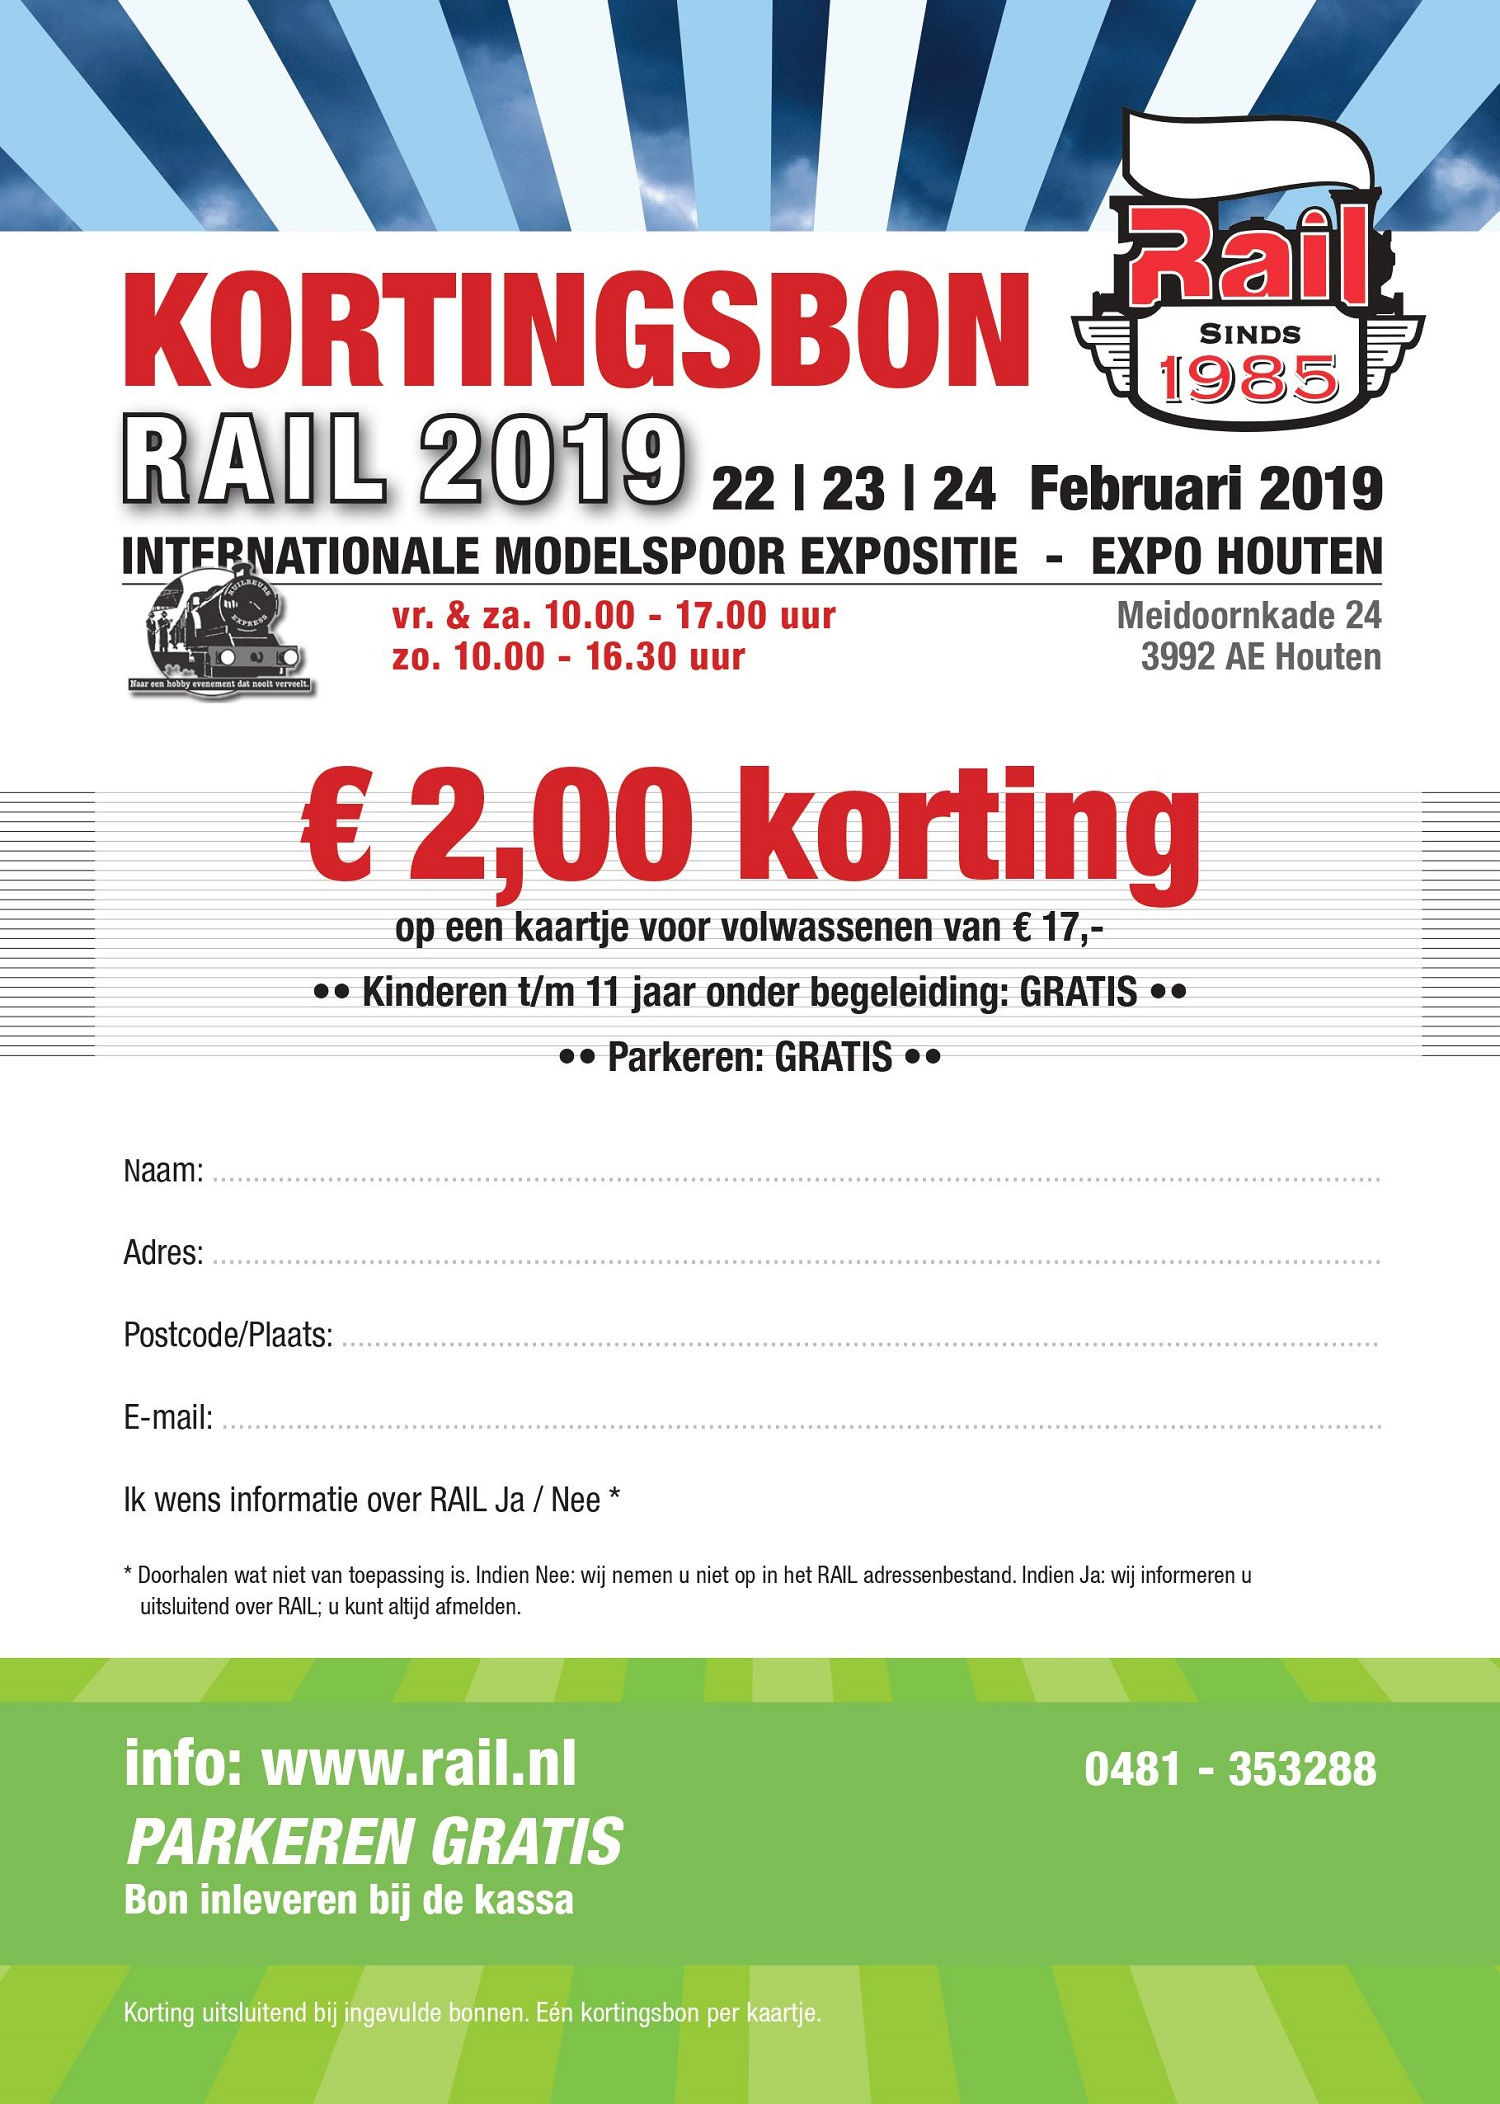 Kortingsbon Rail 2019